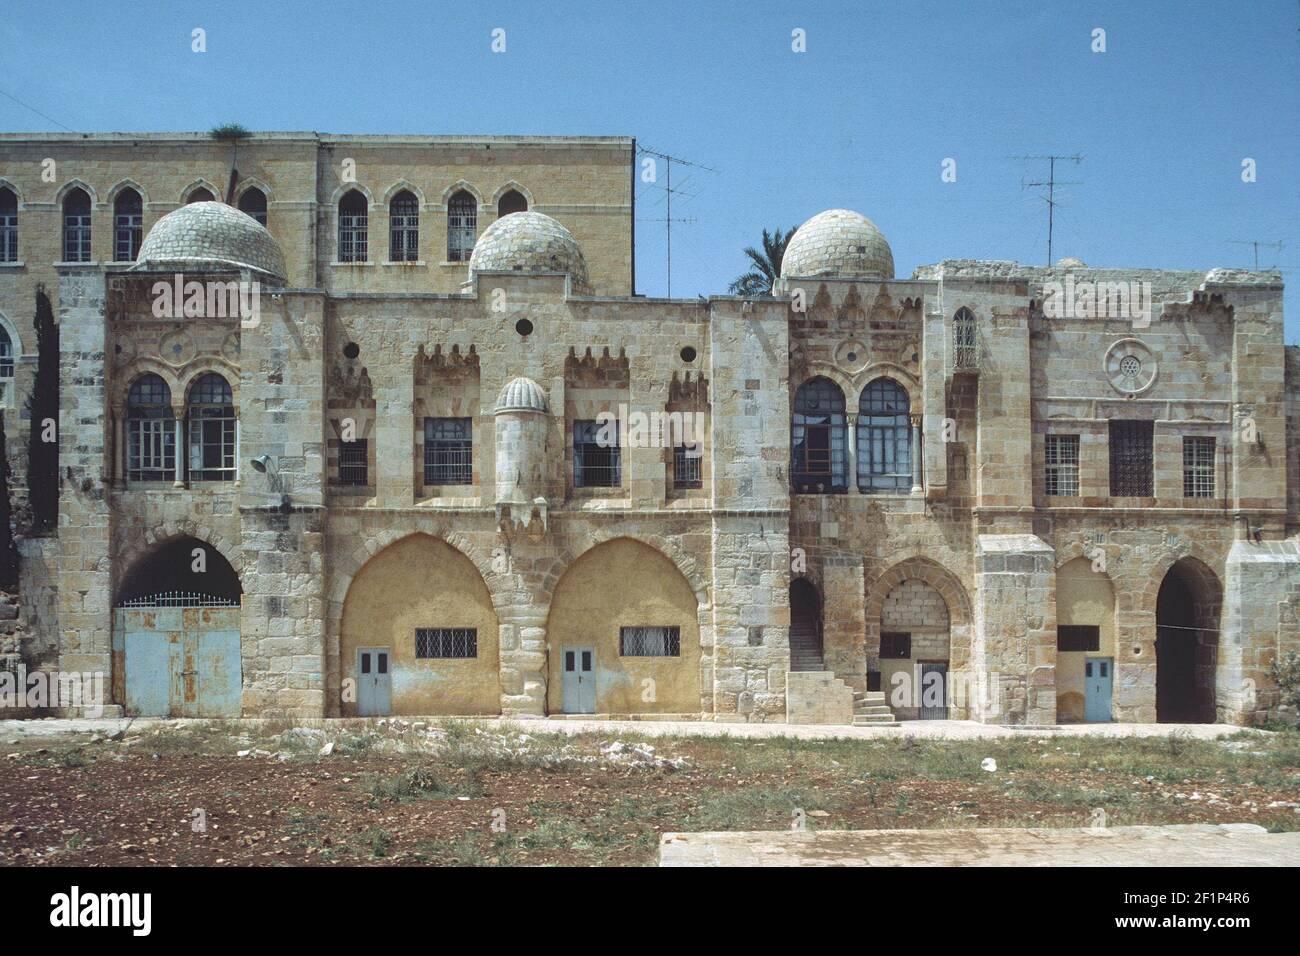 Madrasa al-is'ardiyya, Haram al-Sharif, Jerusalén, Palestina Foto de stock